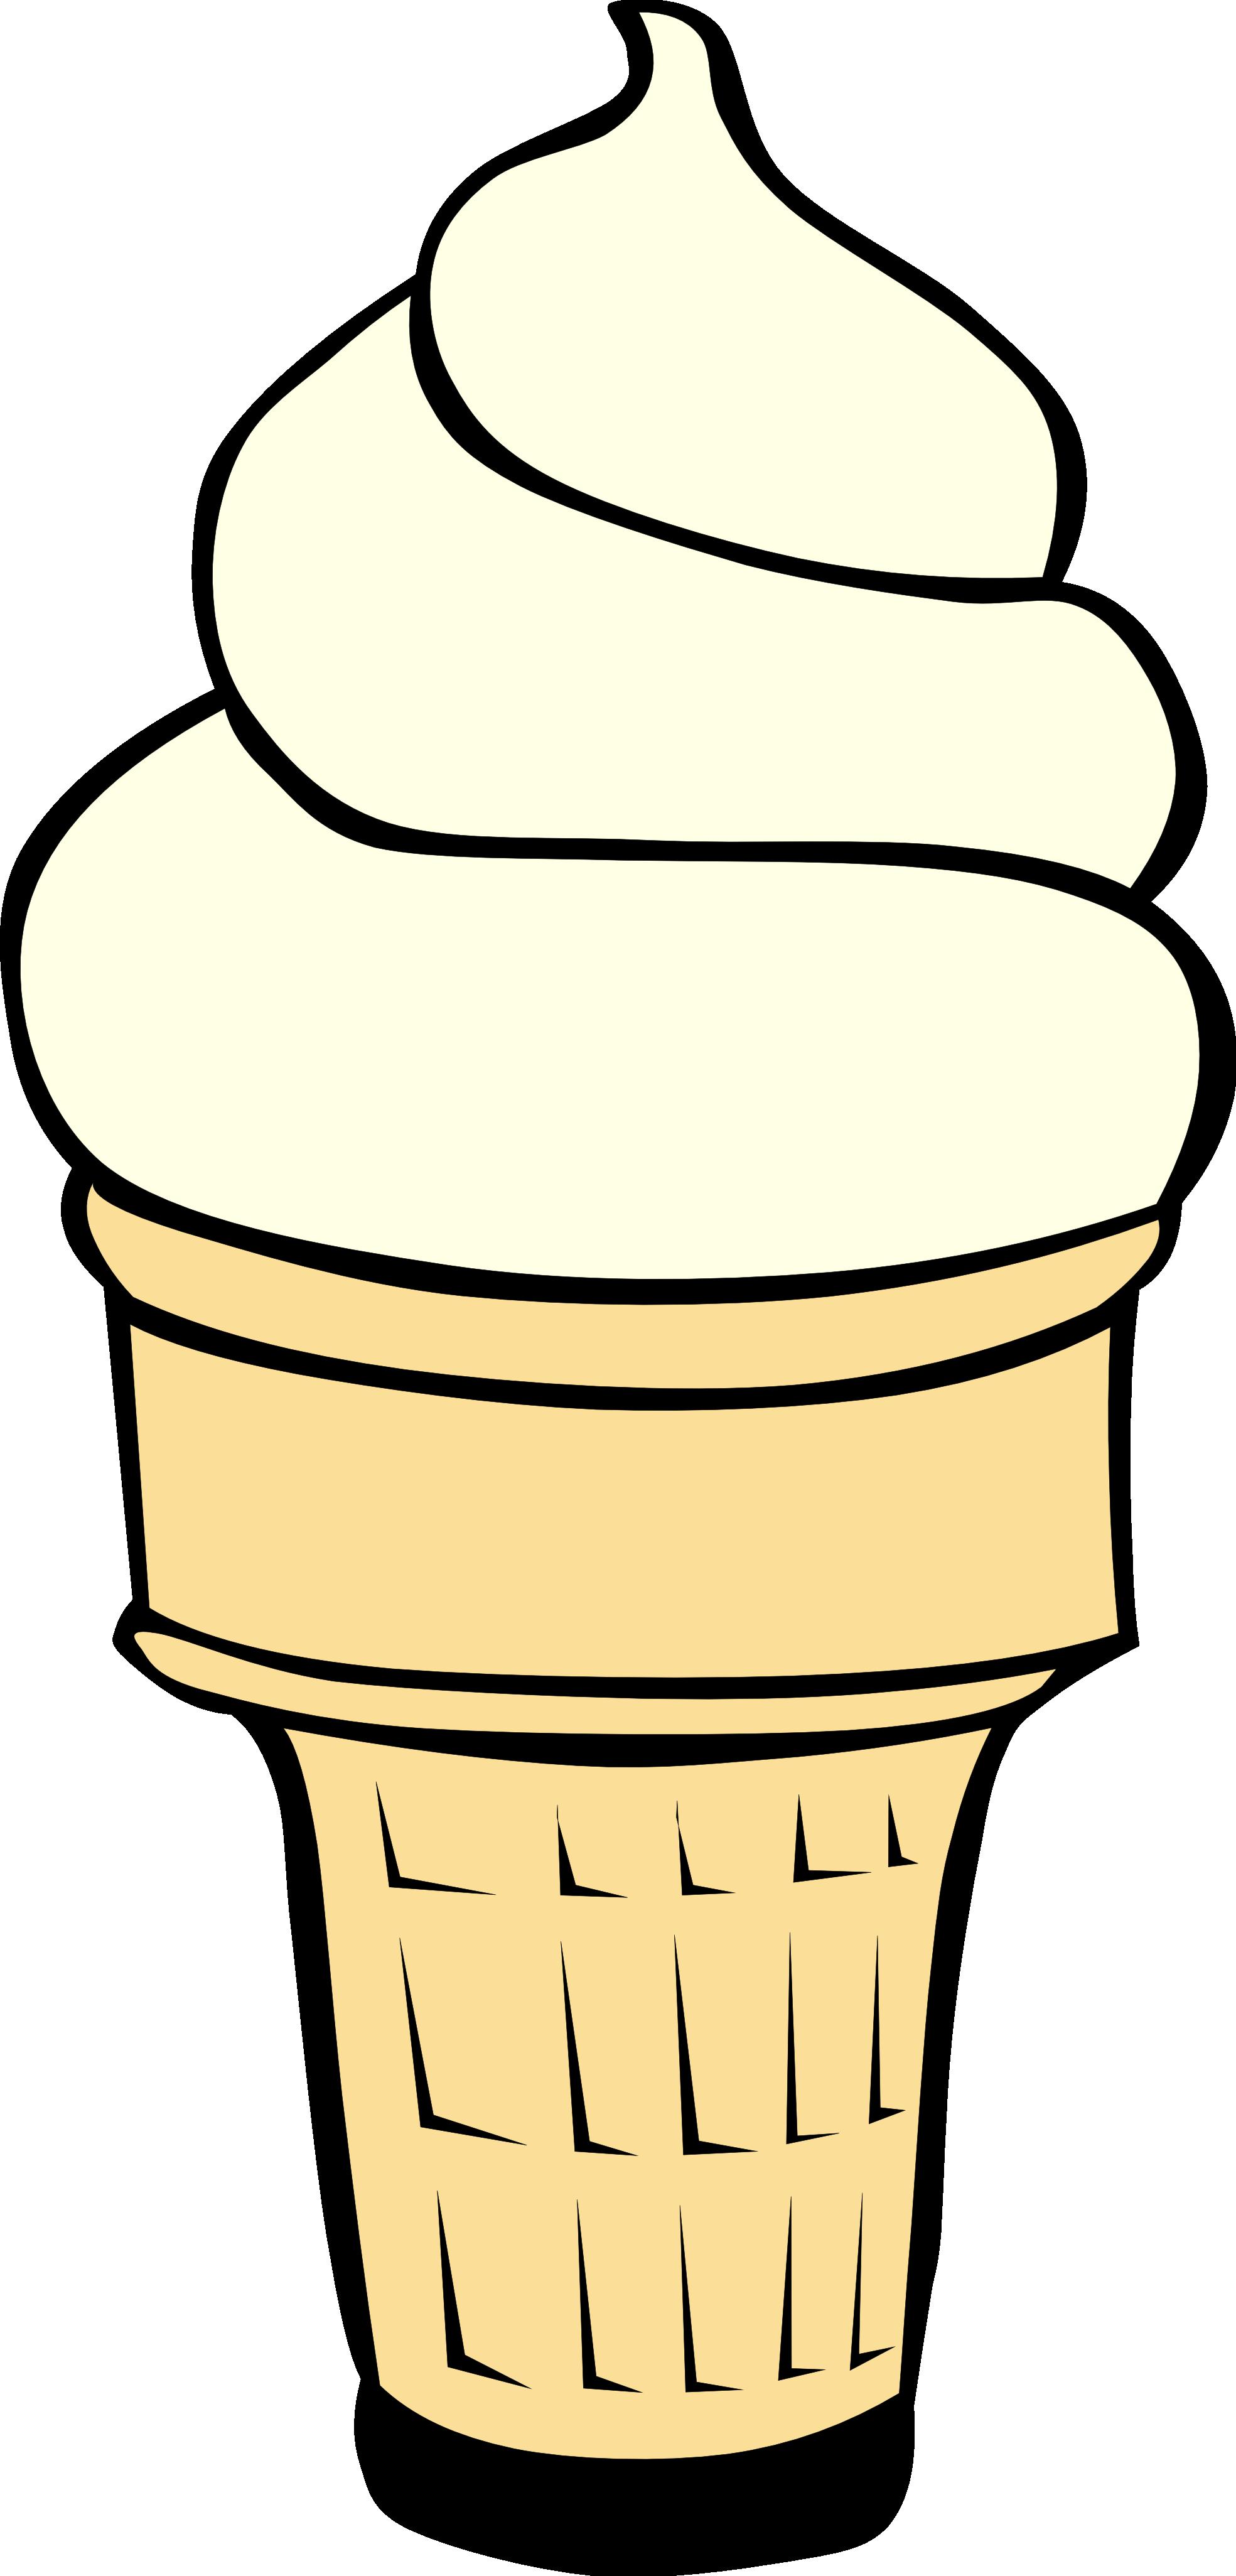 Cone clipart icecream Ice images clip 0 free